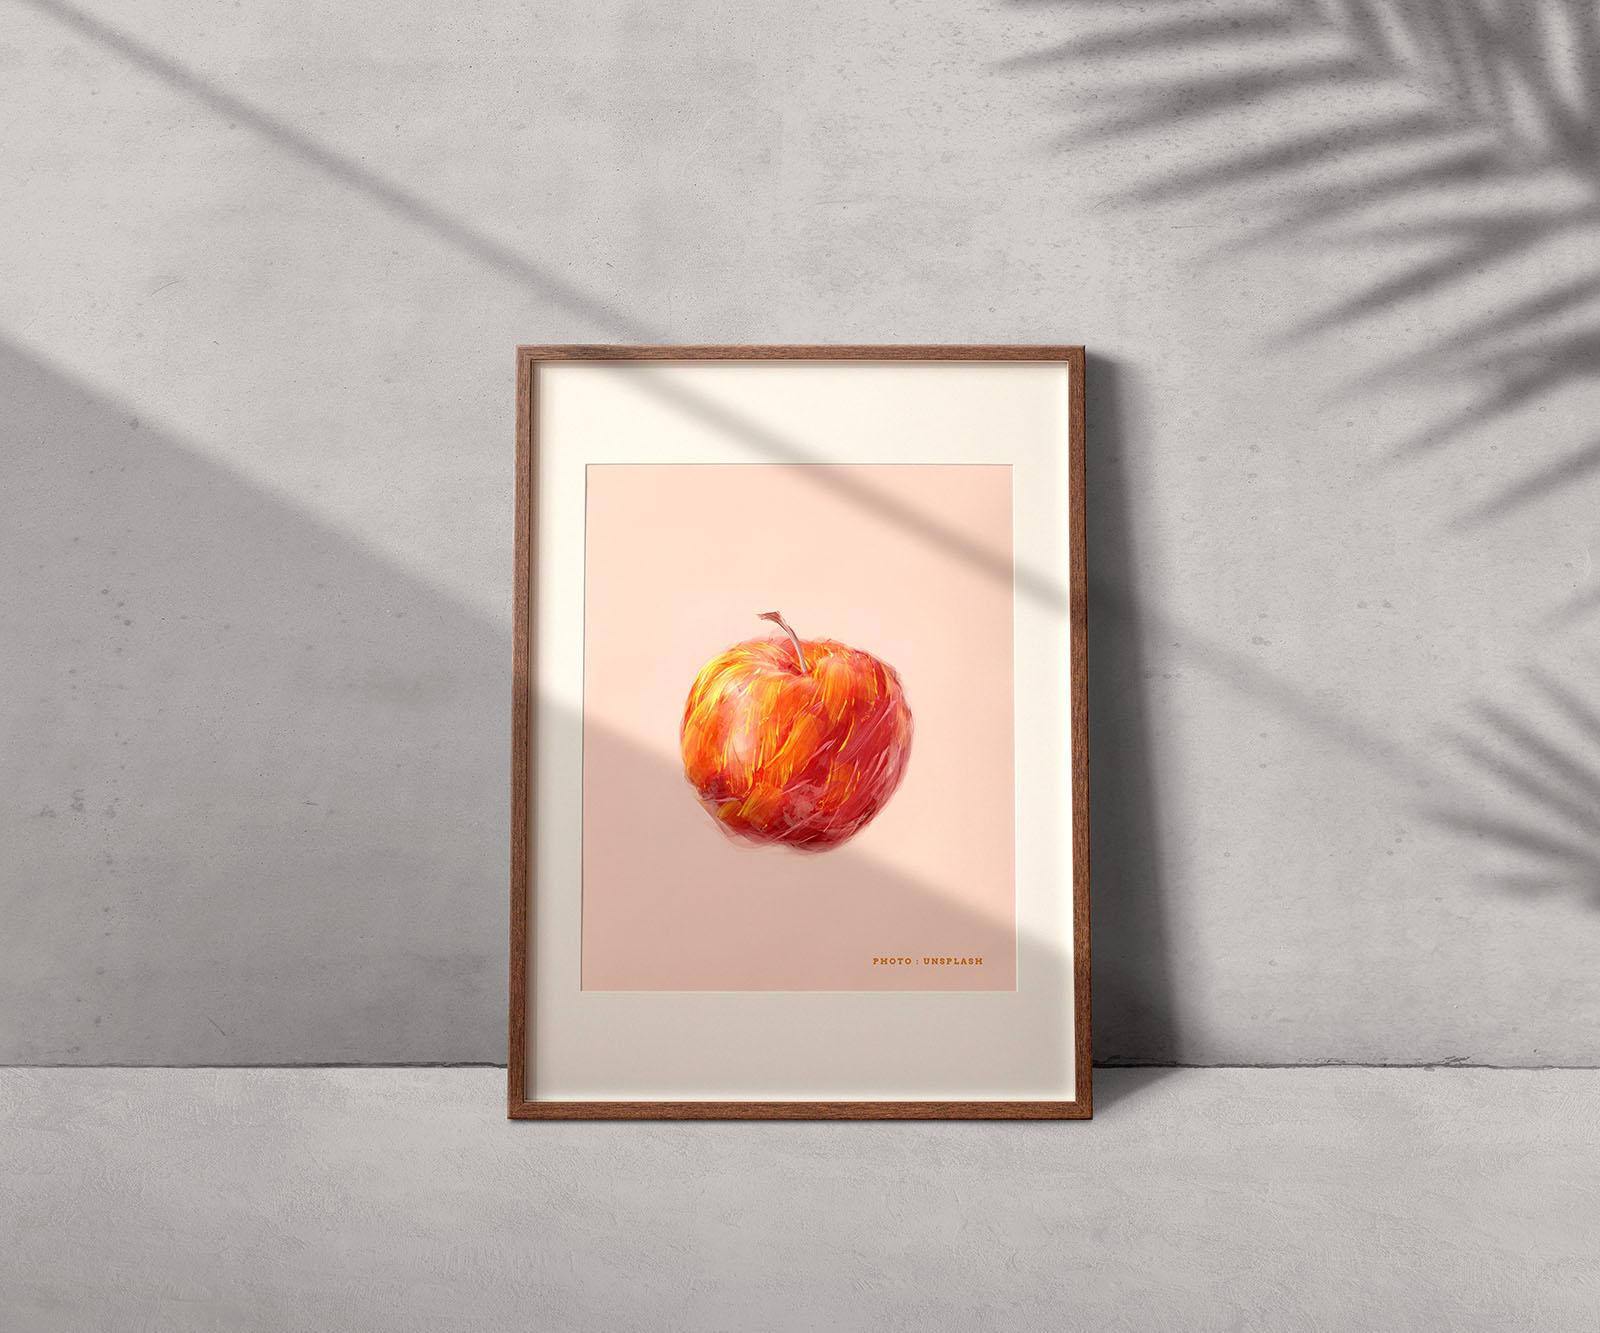 Free Photo Frame Mockup Template